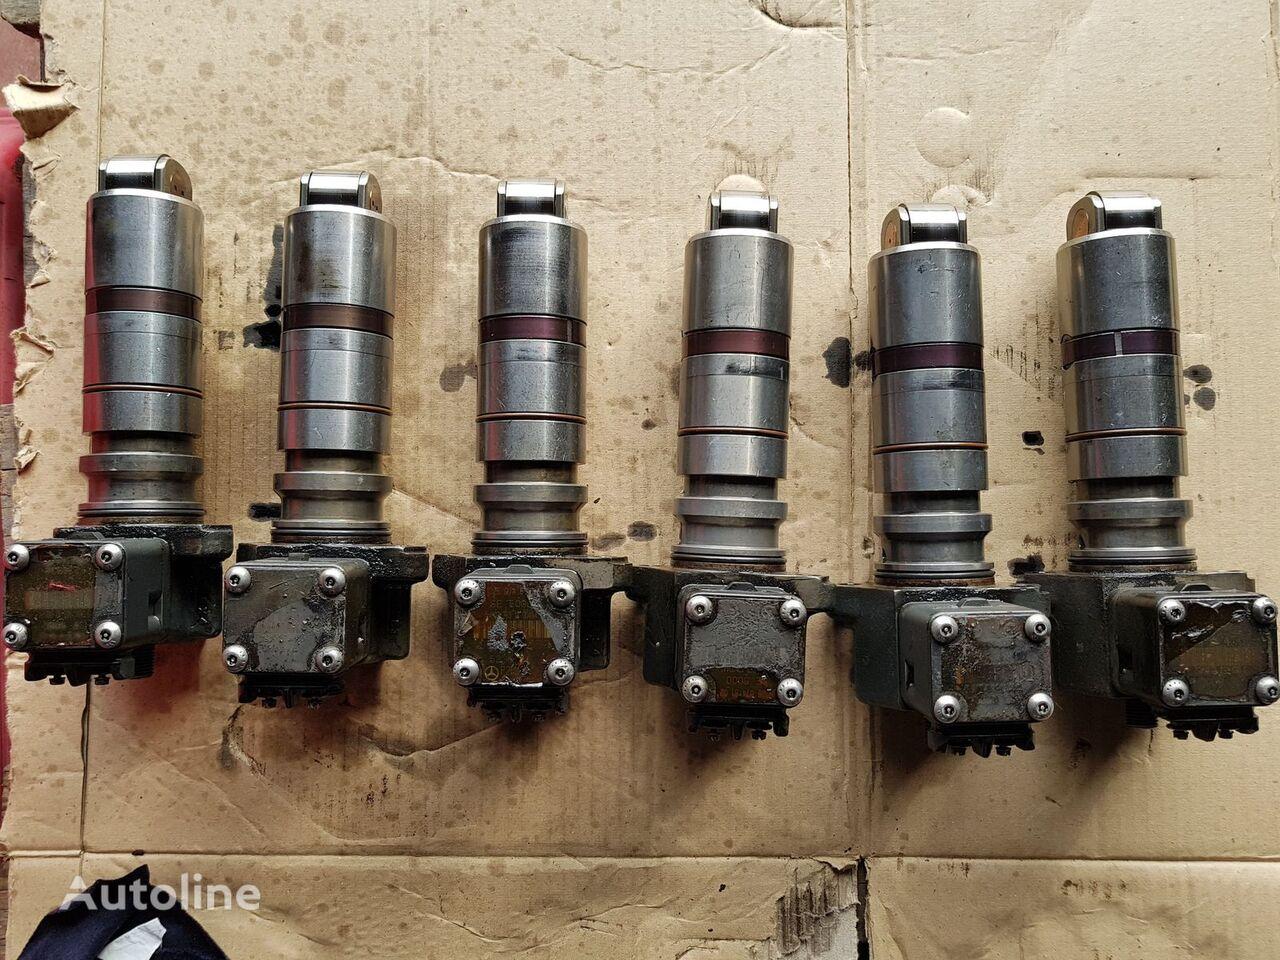 MERCEDES-BENZ pumpa za ugrizgavanje goriva za MERCEDES-BENZ ATEGO,ACTROS tegljača